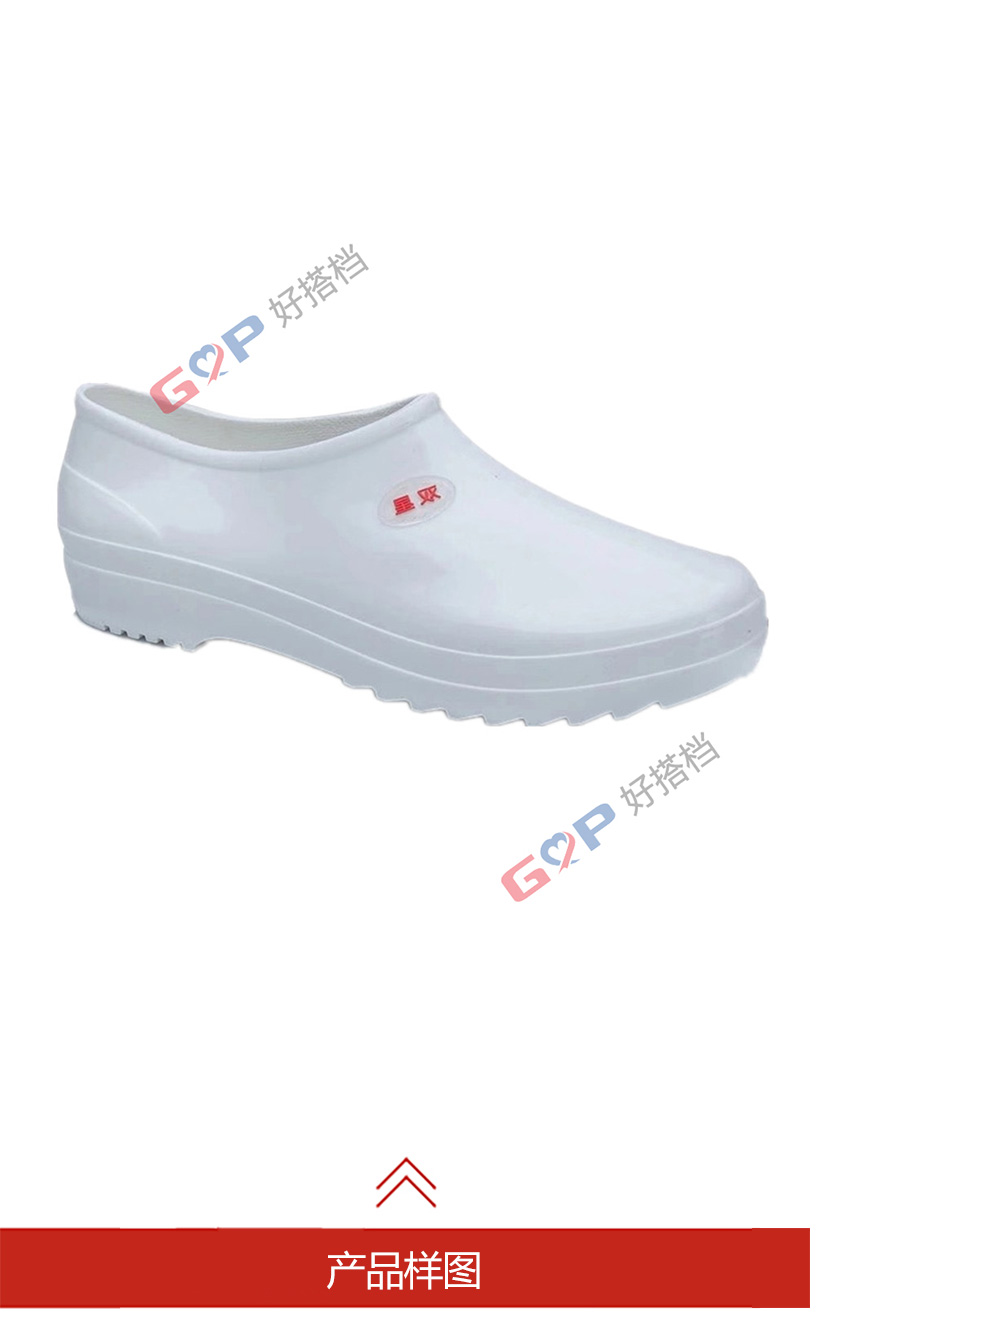 3-011A低帮胶鞋食品级